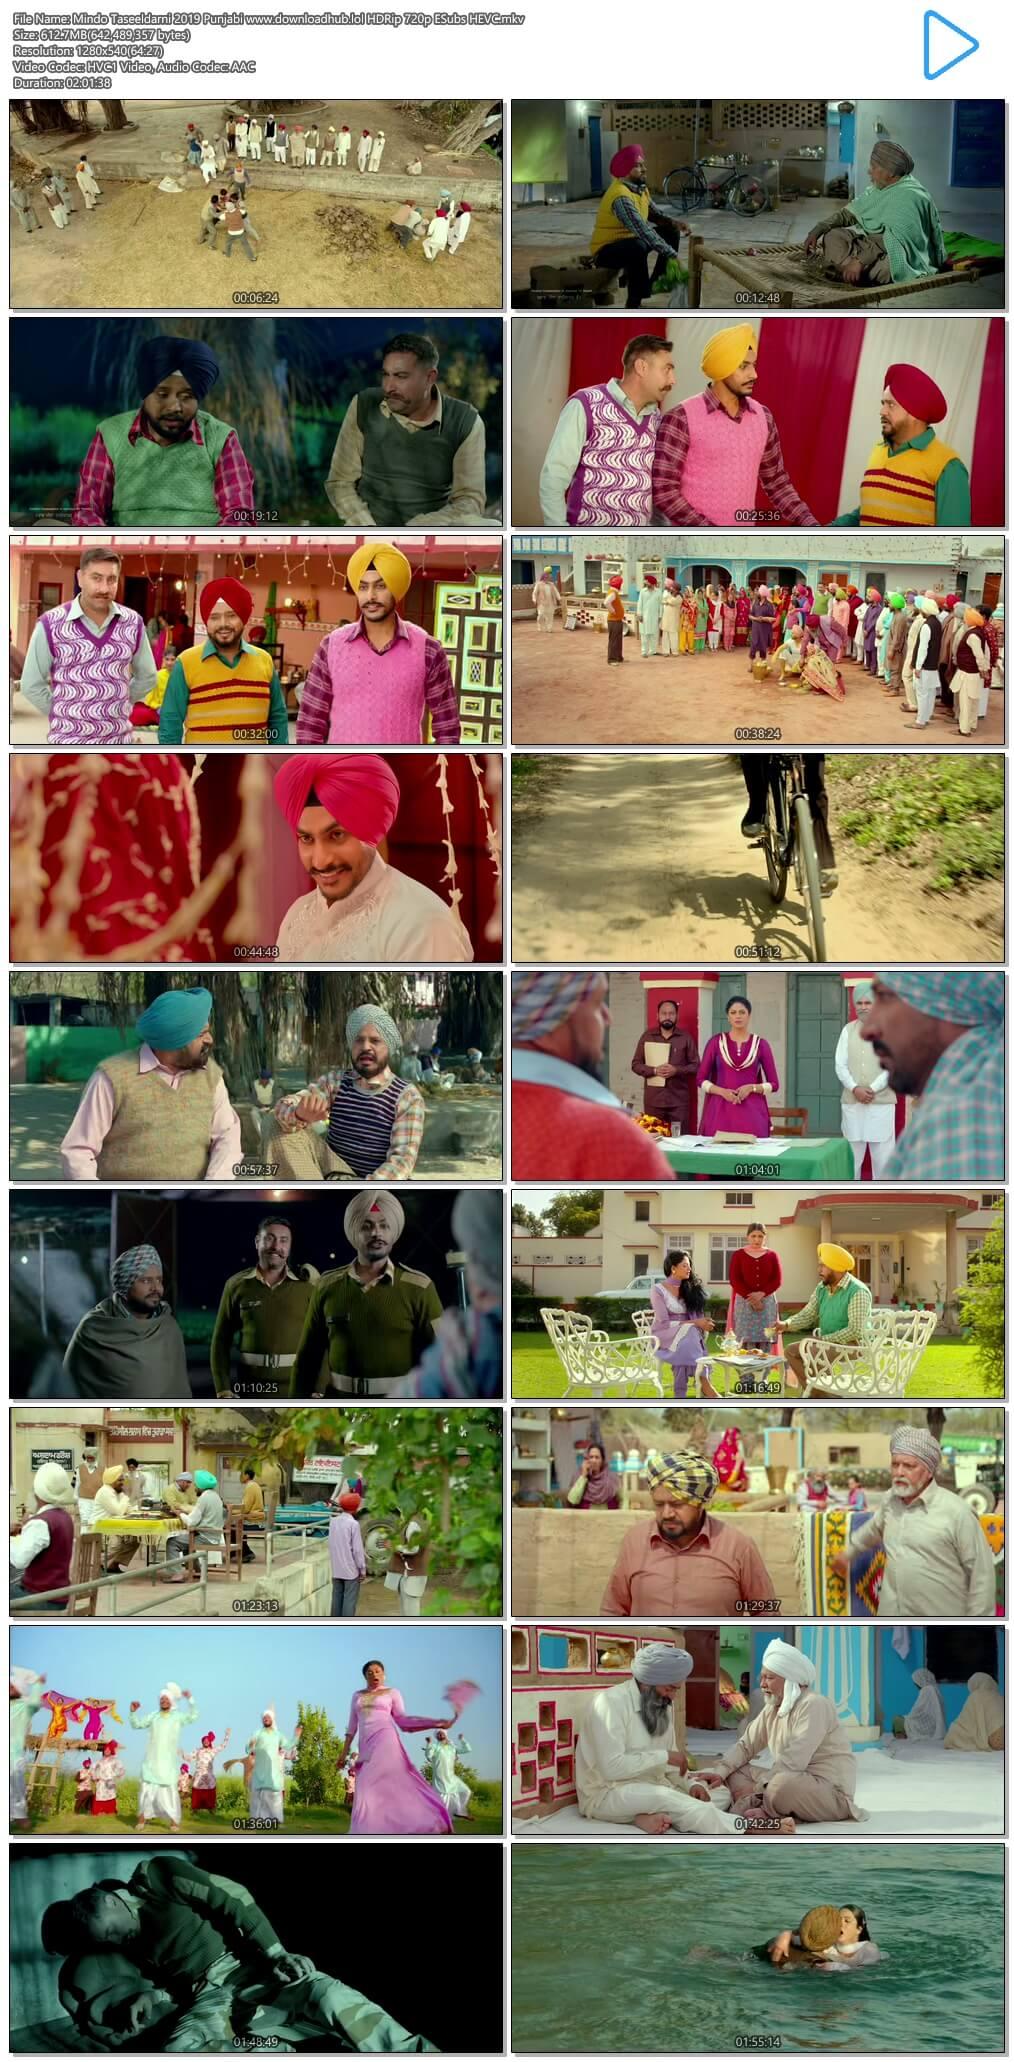 Mindo Taseeldarni 2019 Punjabi 600MB HDRip 720p ESubs HEVC